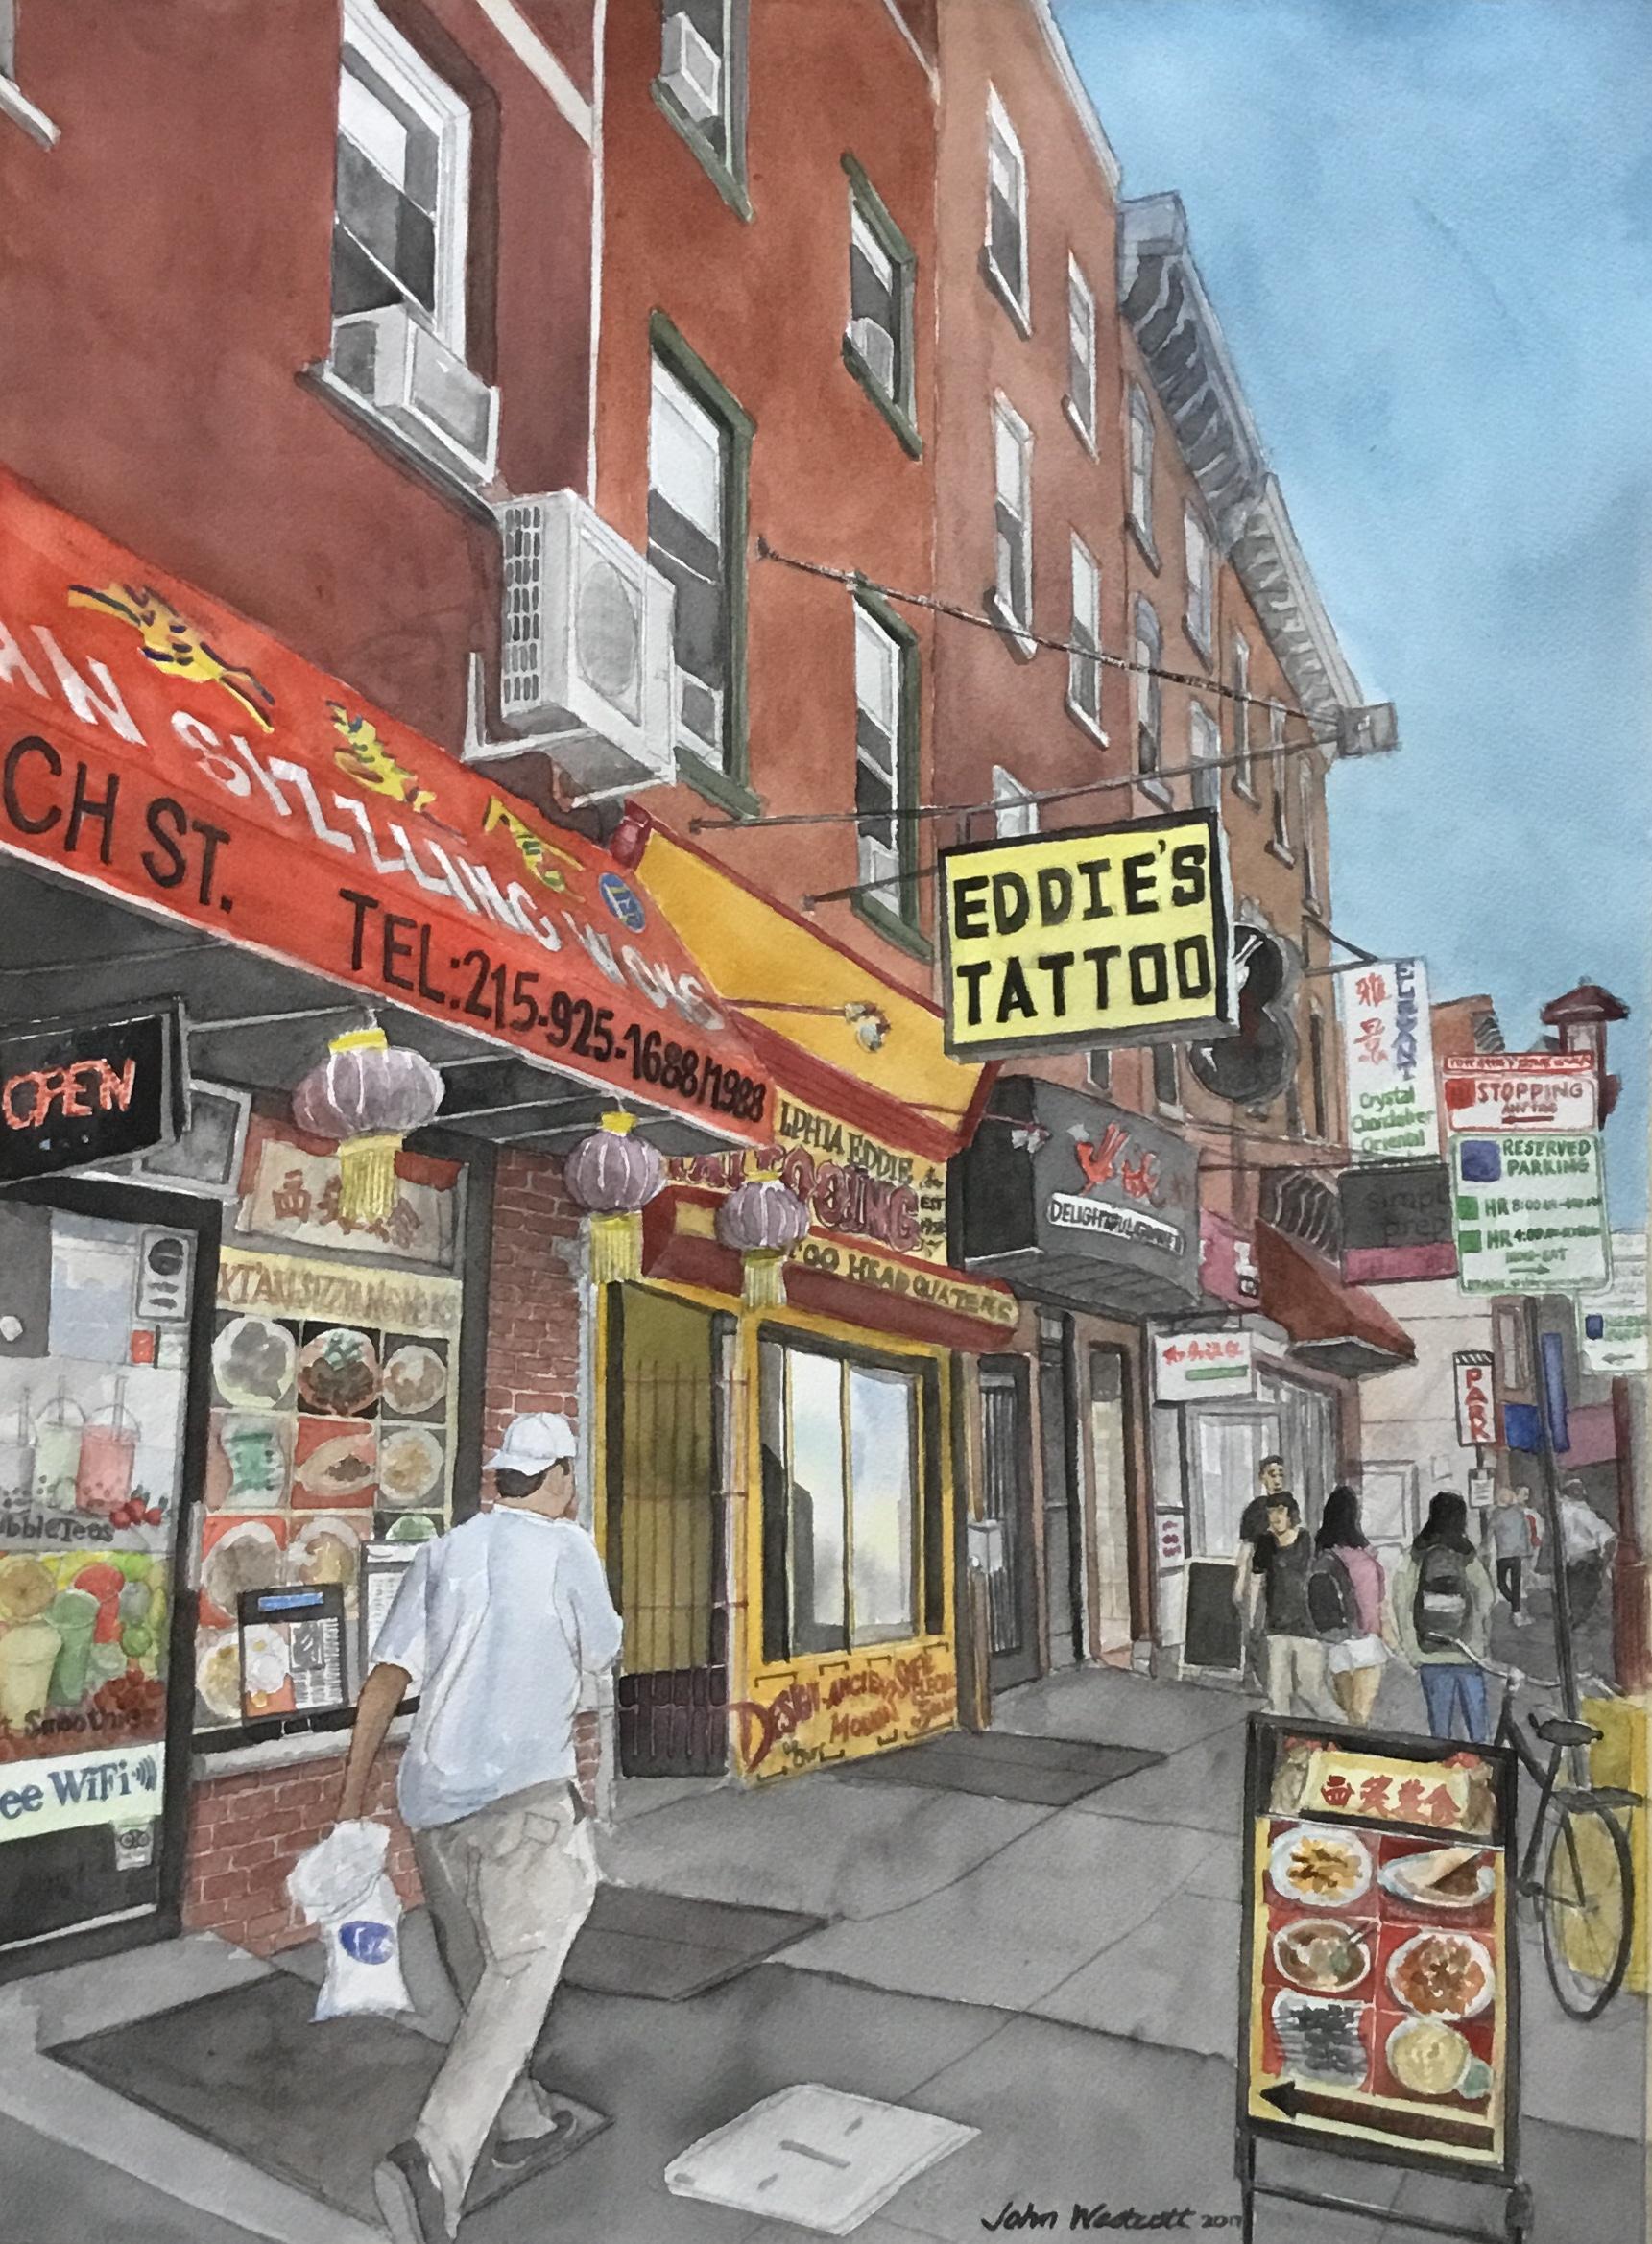 9th & Arch -Chinatown, Philadelphia